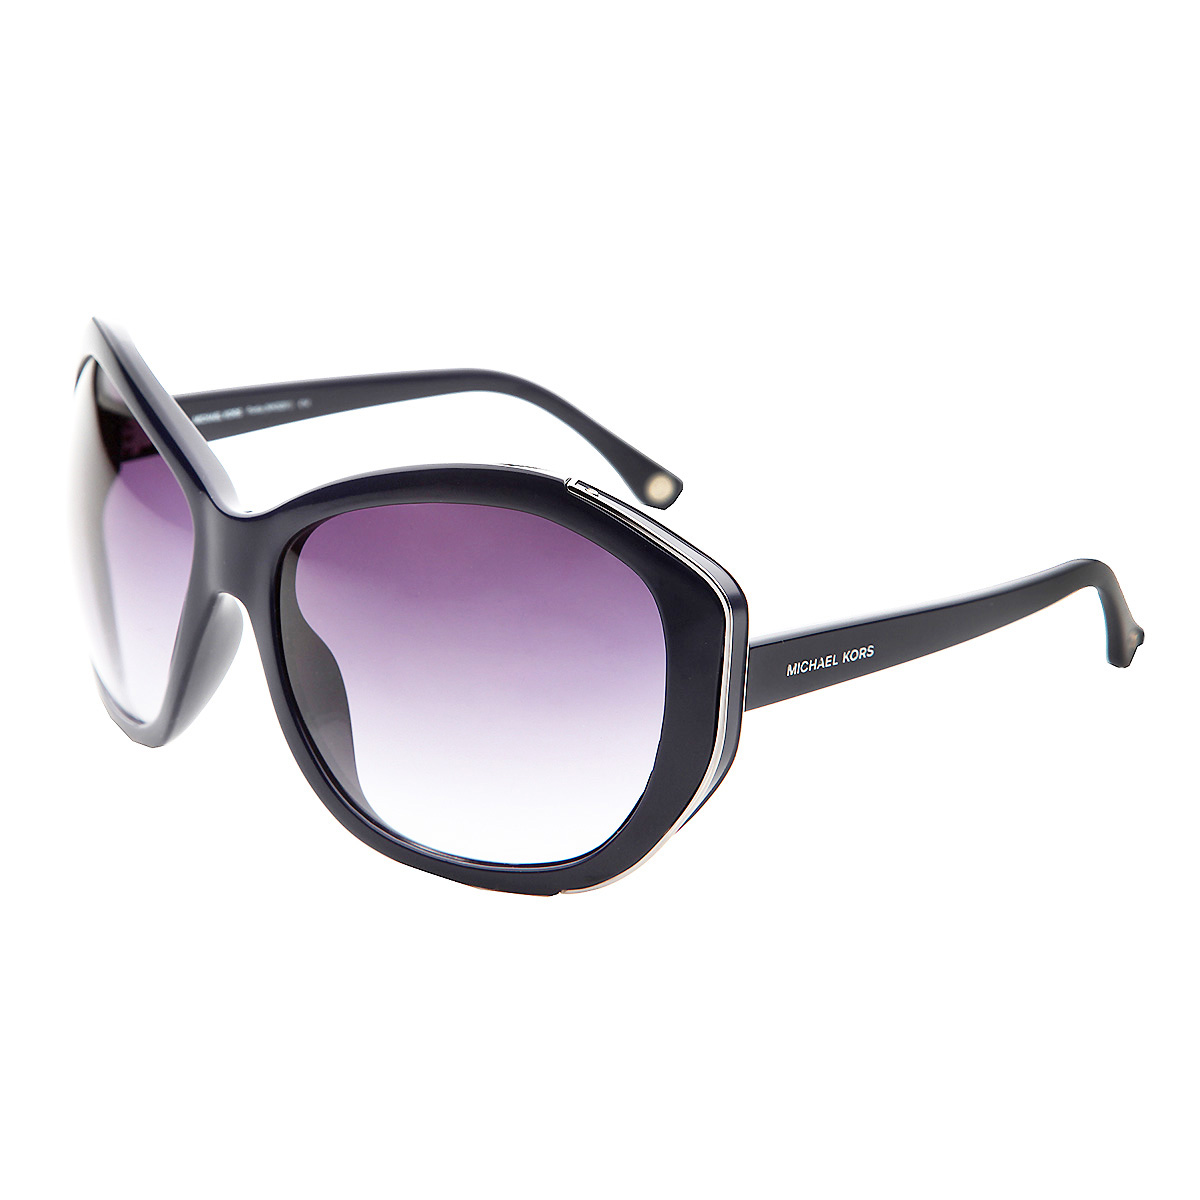 michael kors sonnenbrille mks291 414 damen portia lady sunglasses blau neu ovp. Black Bedroom Furniture Sets. Home Design Ideas